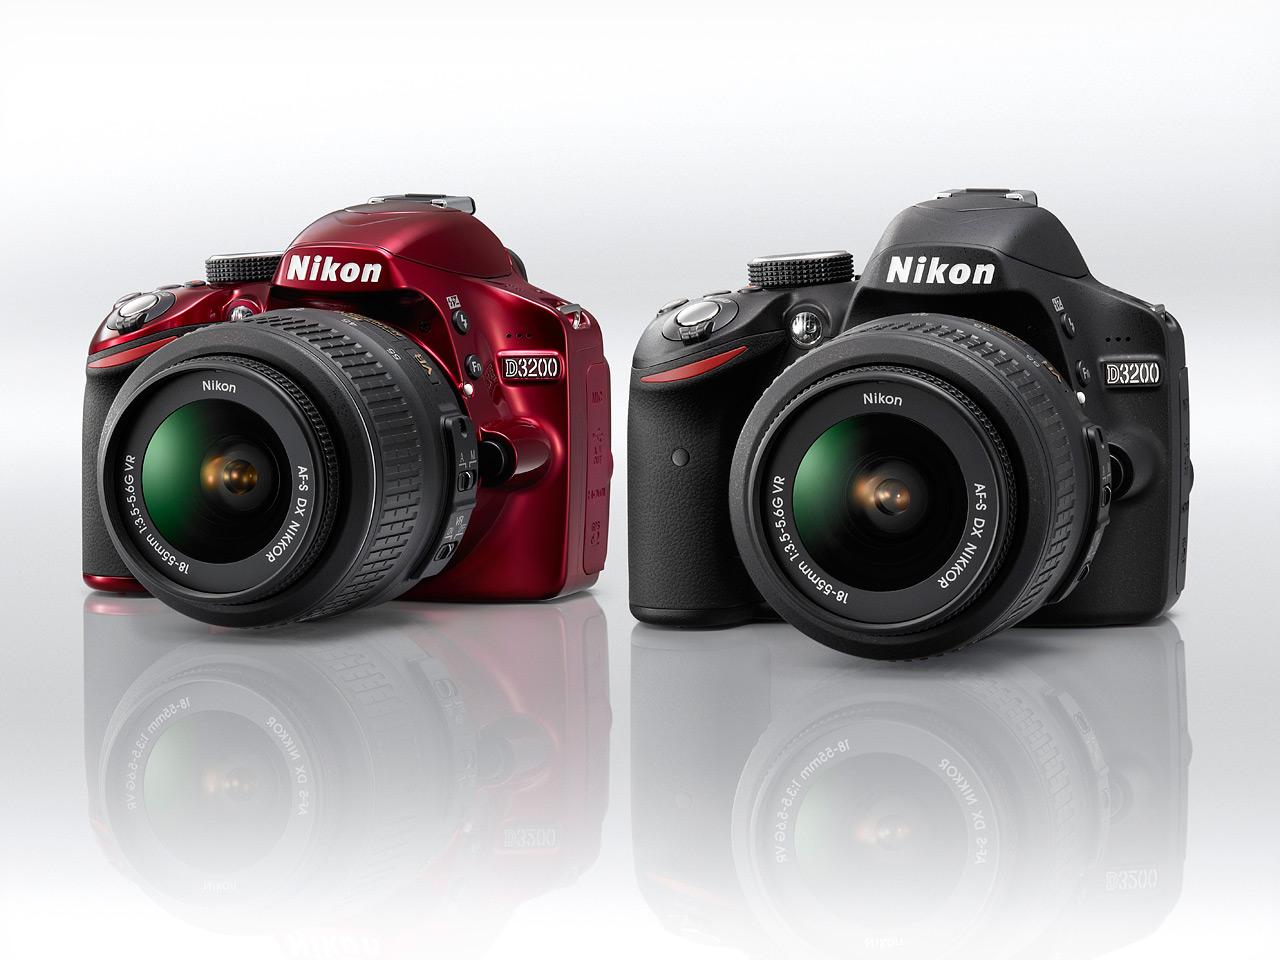 nikon updates entry level dslr with 24mp d3200 and optional wifi rh dpreview com manual focus nikon d3200 manual camera nikon d3300 portugues